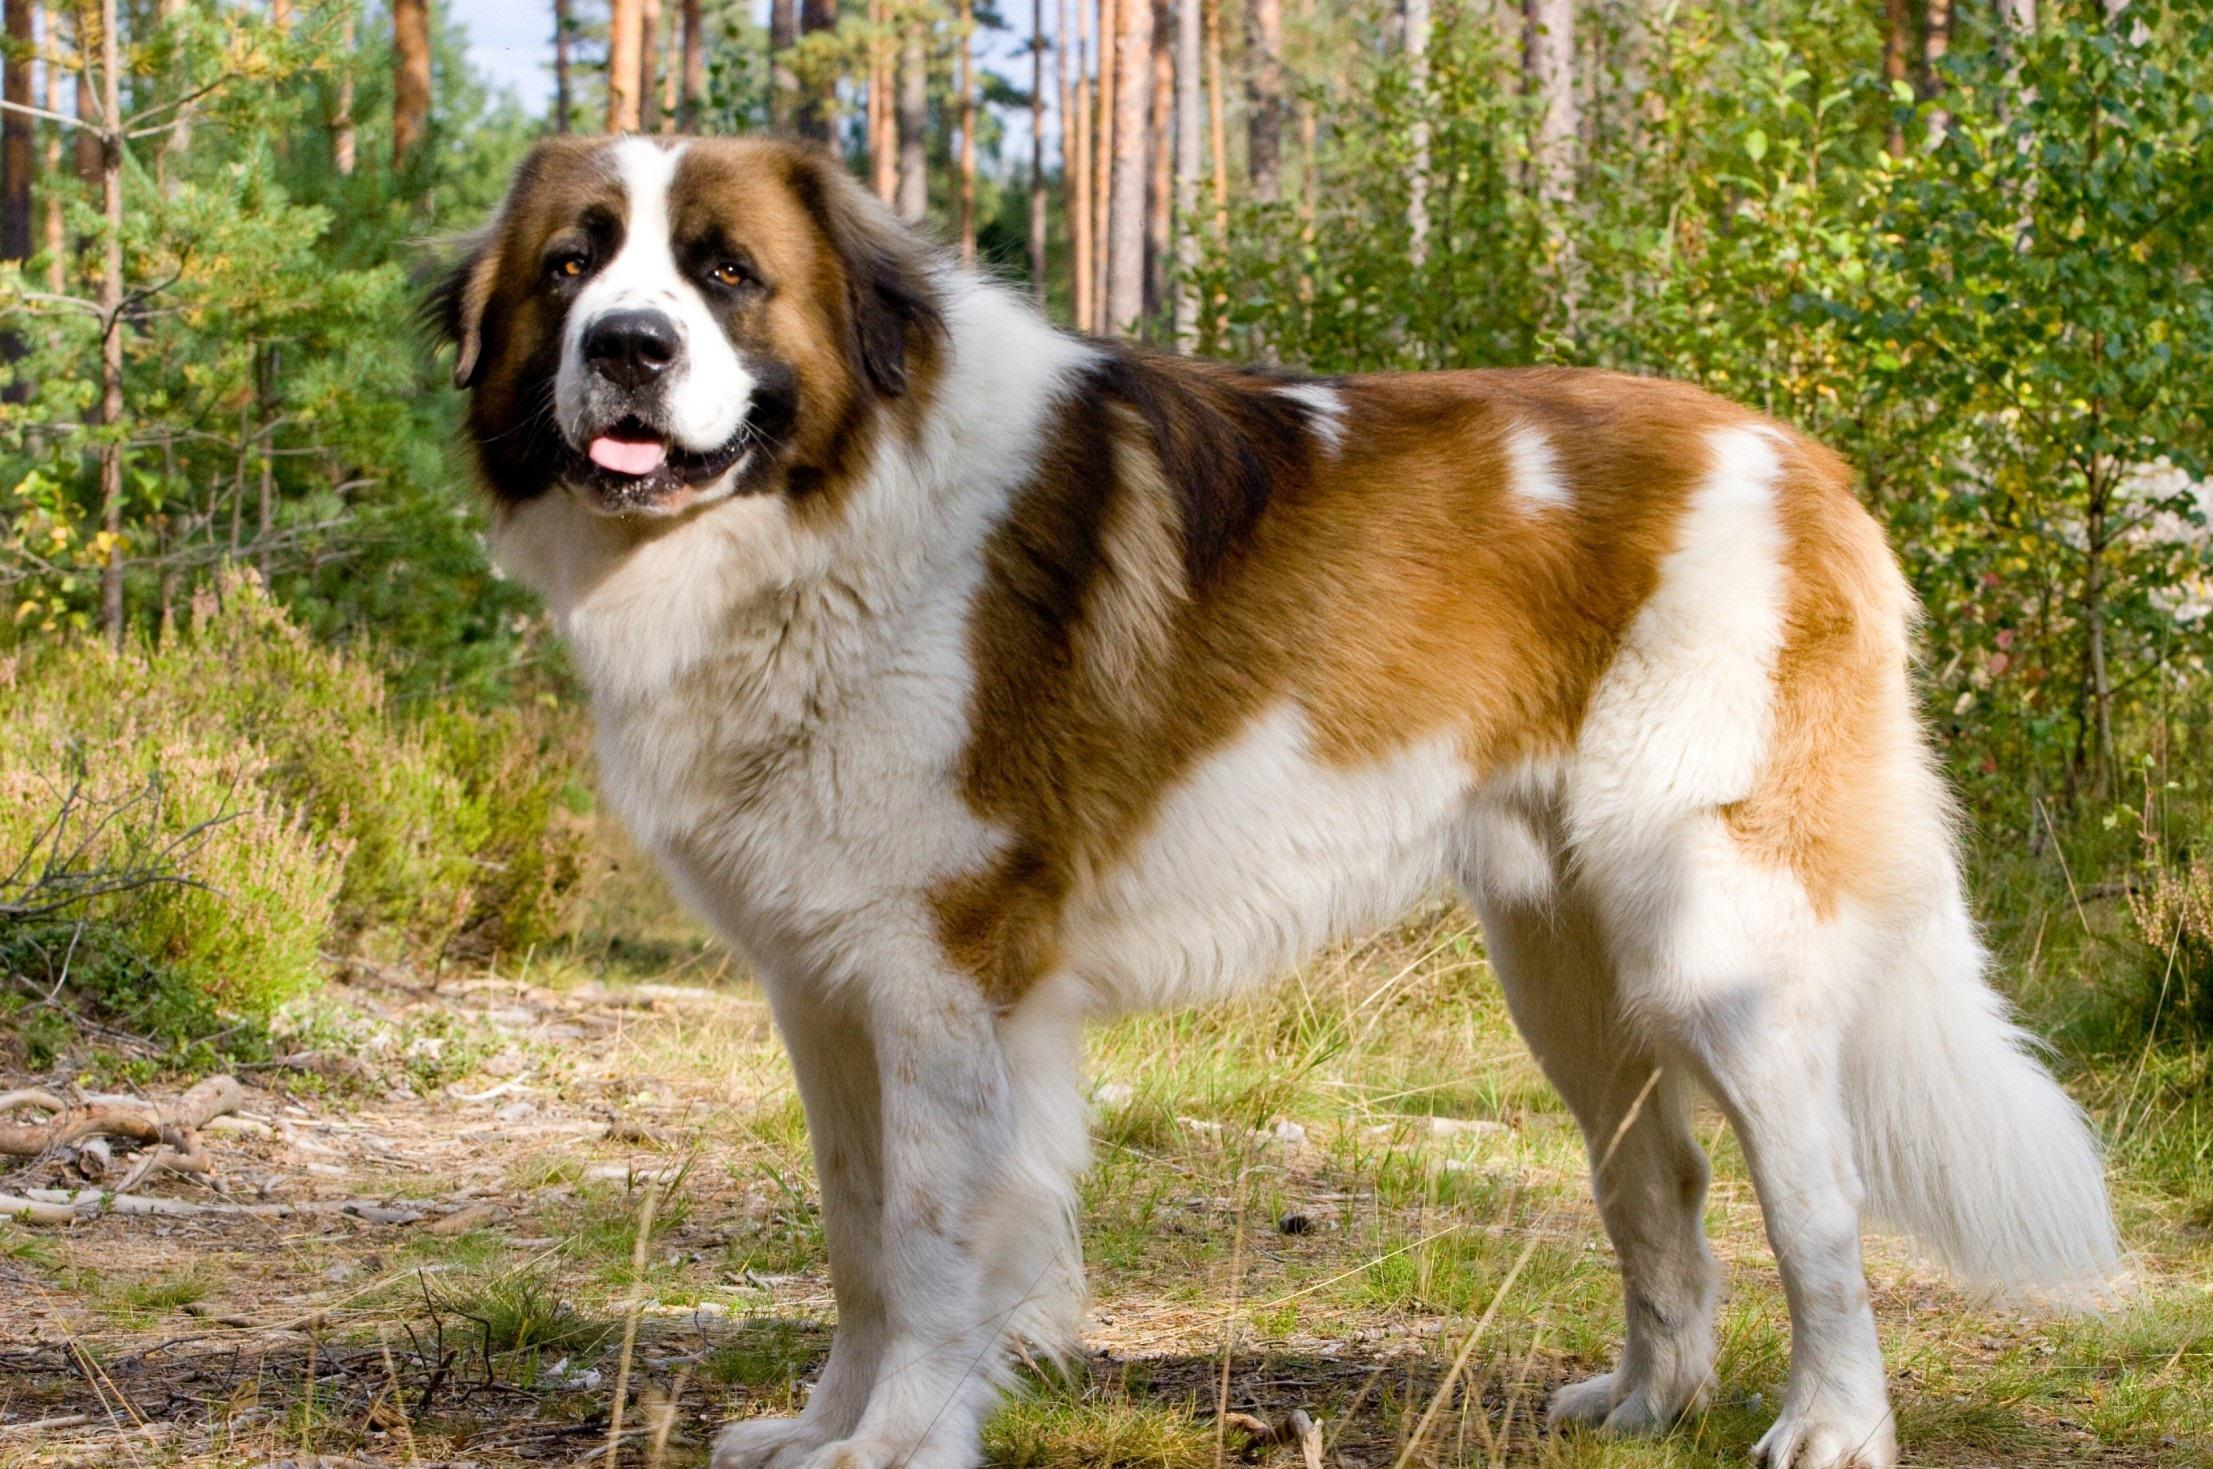 Saint bernard dog photo